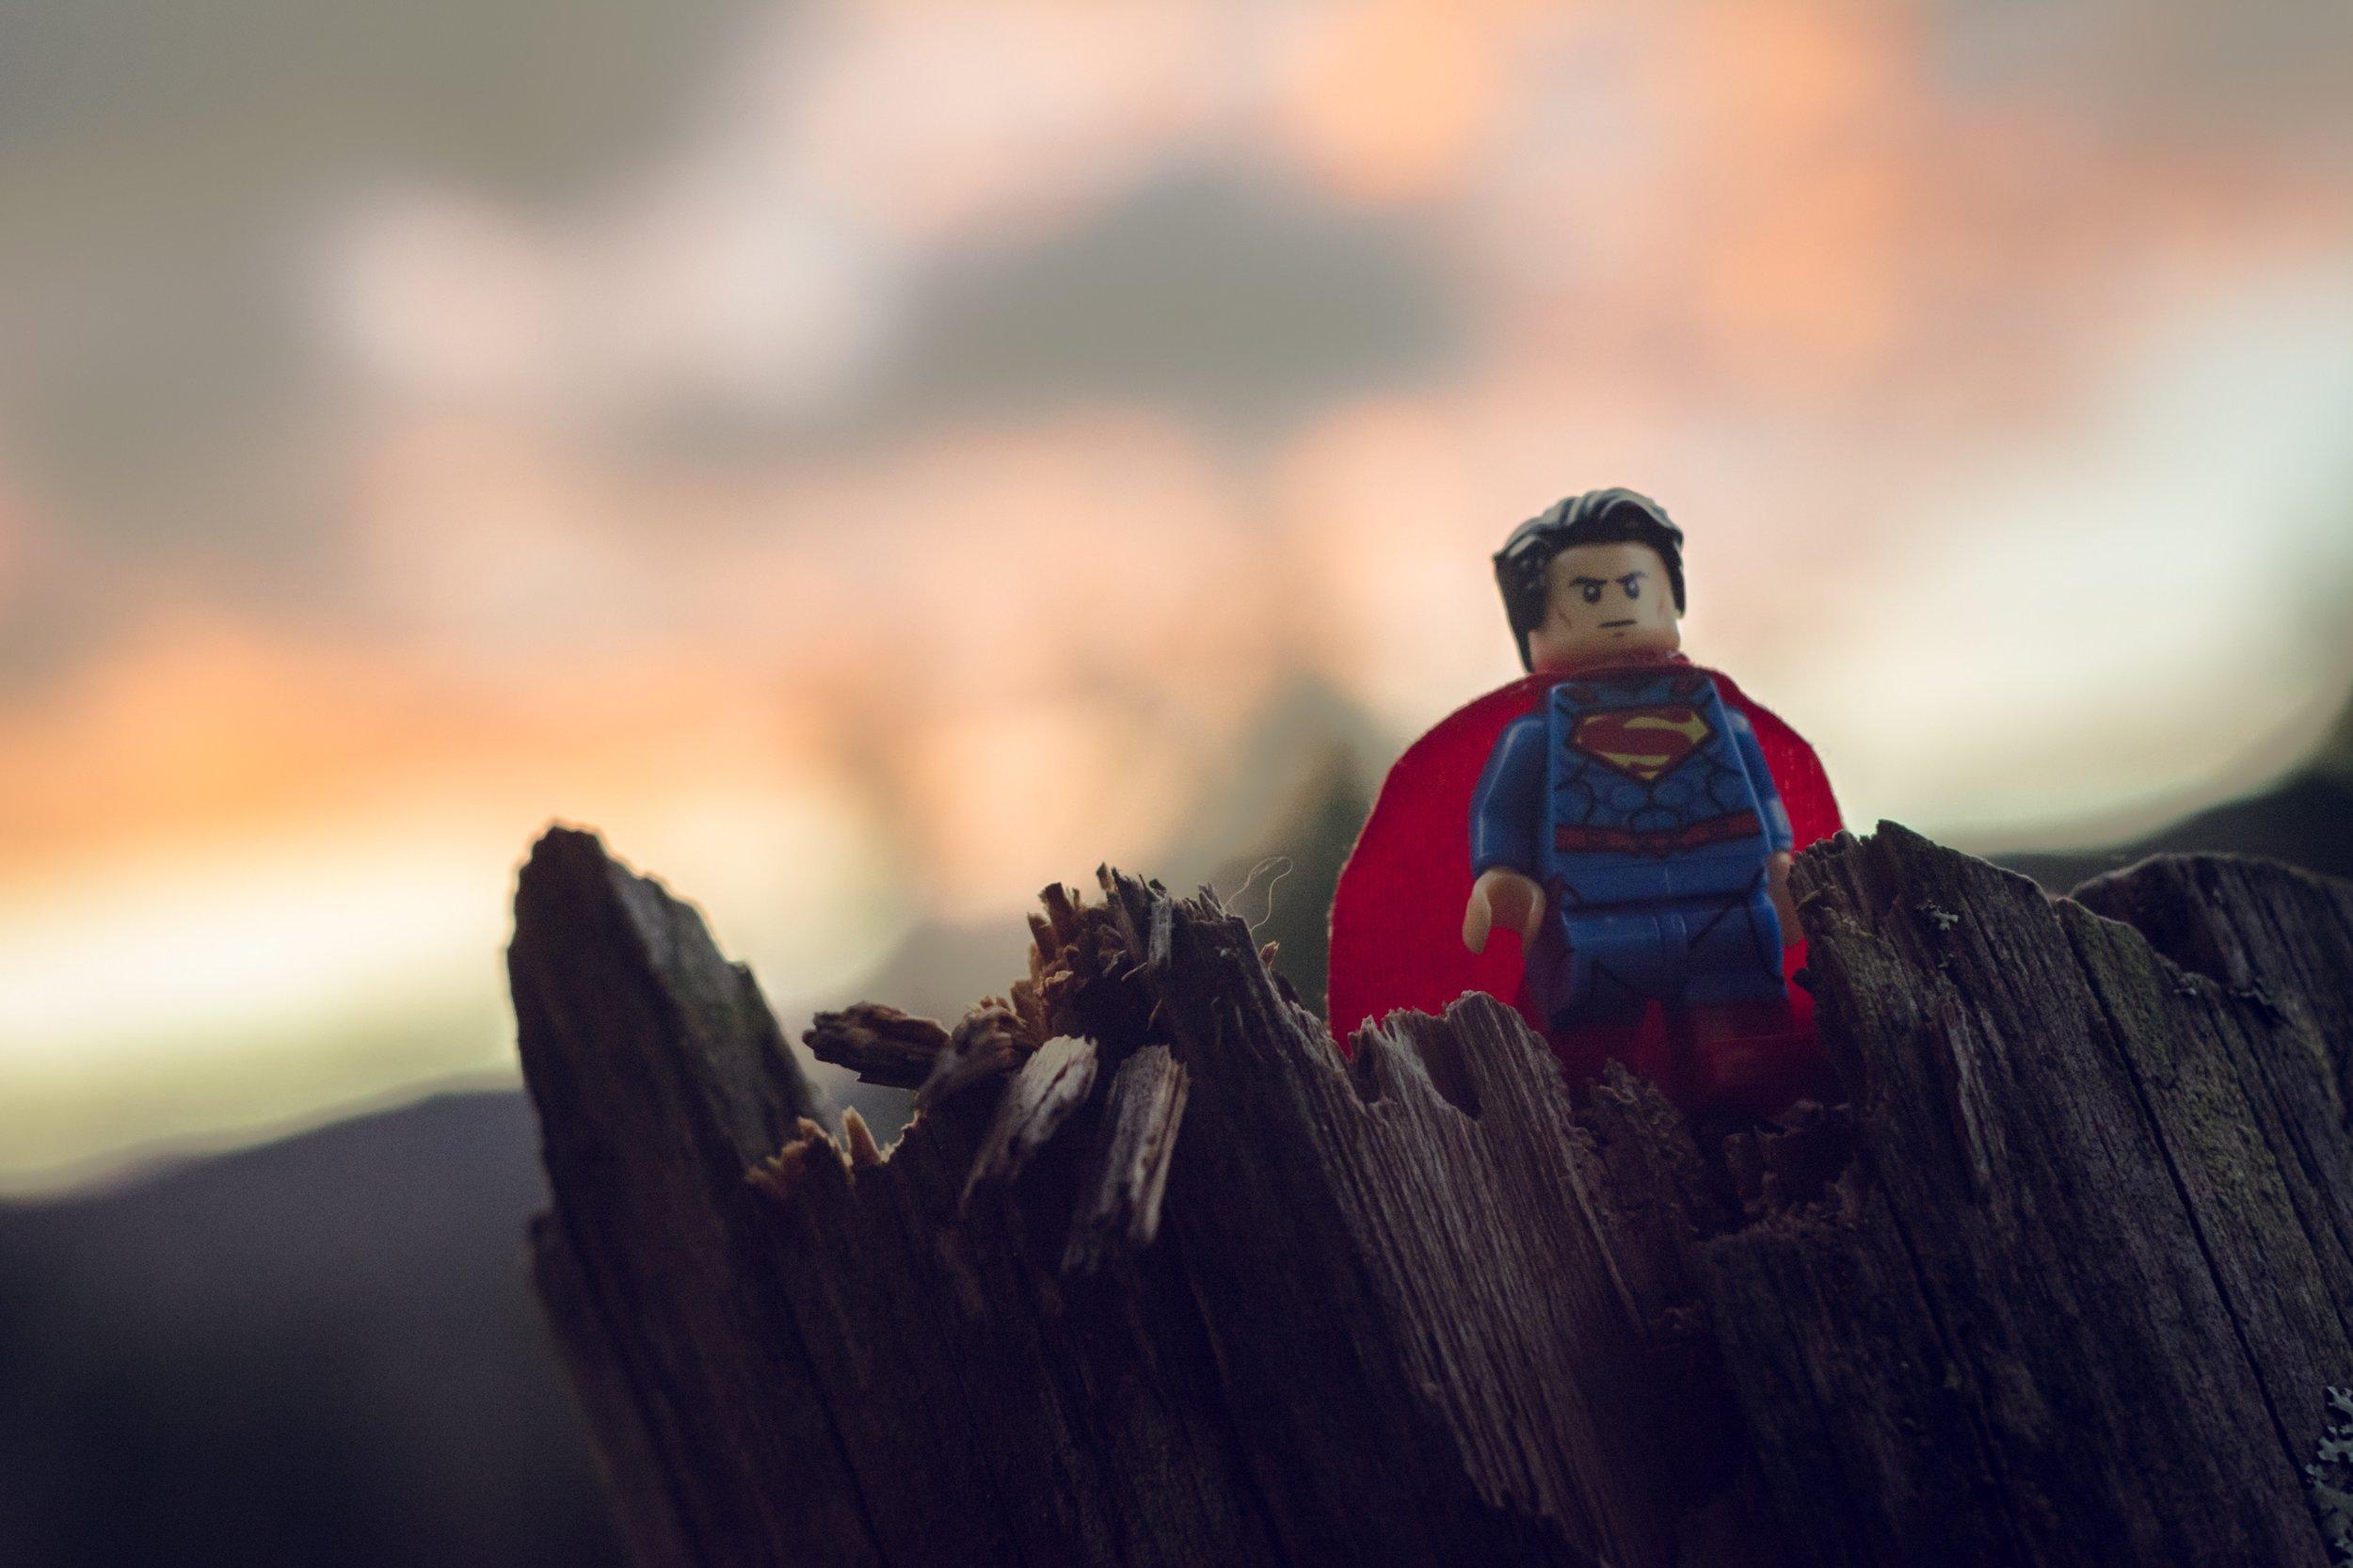 A small Superman action figure on a tree. Credit: Esteban Lopez/Unsplash